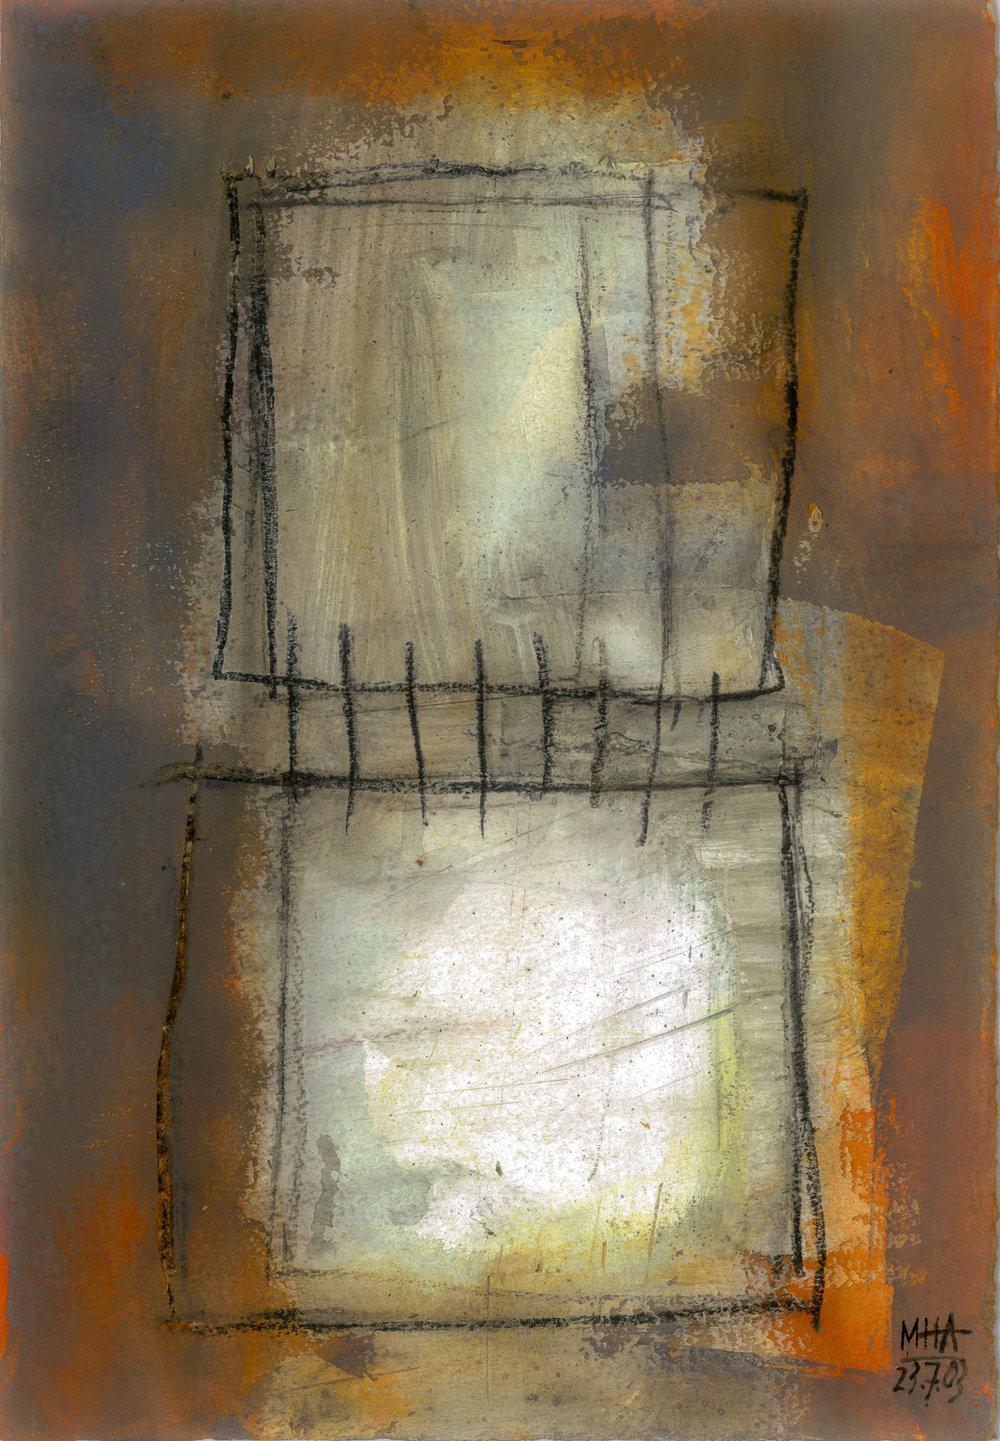 11  VERBUNDEN, 2003, Acryl auf Papier, 15x23,5 cm